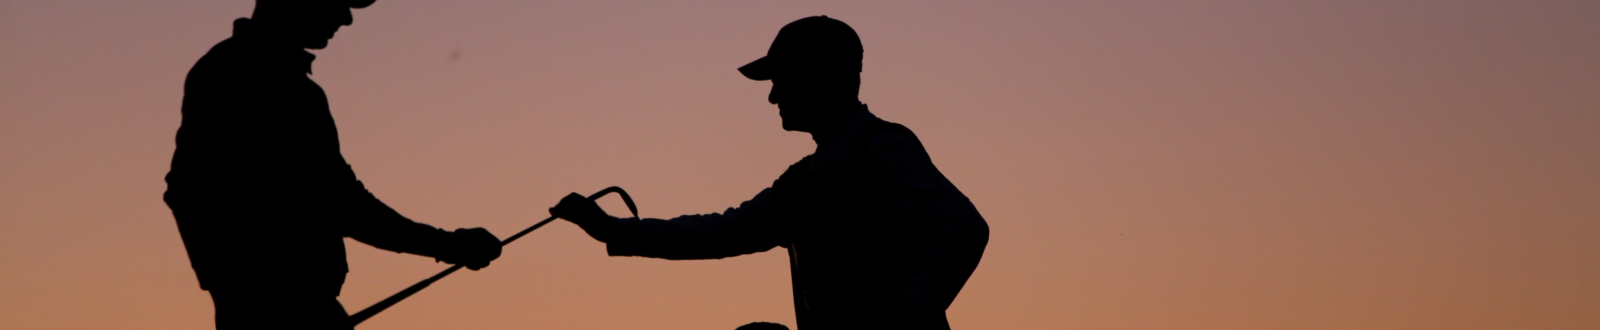 Caddie handing a golfer a club at dusk